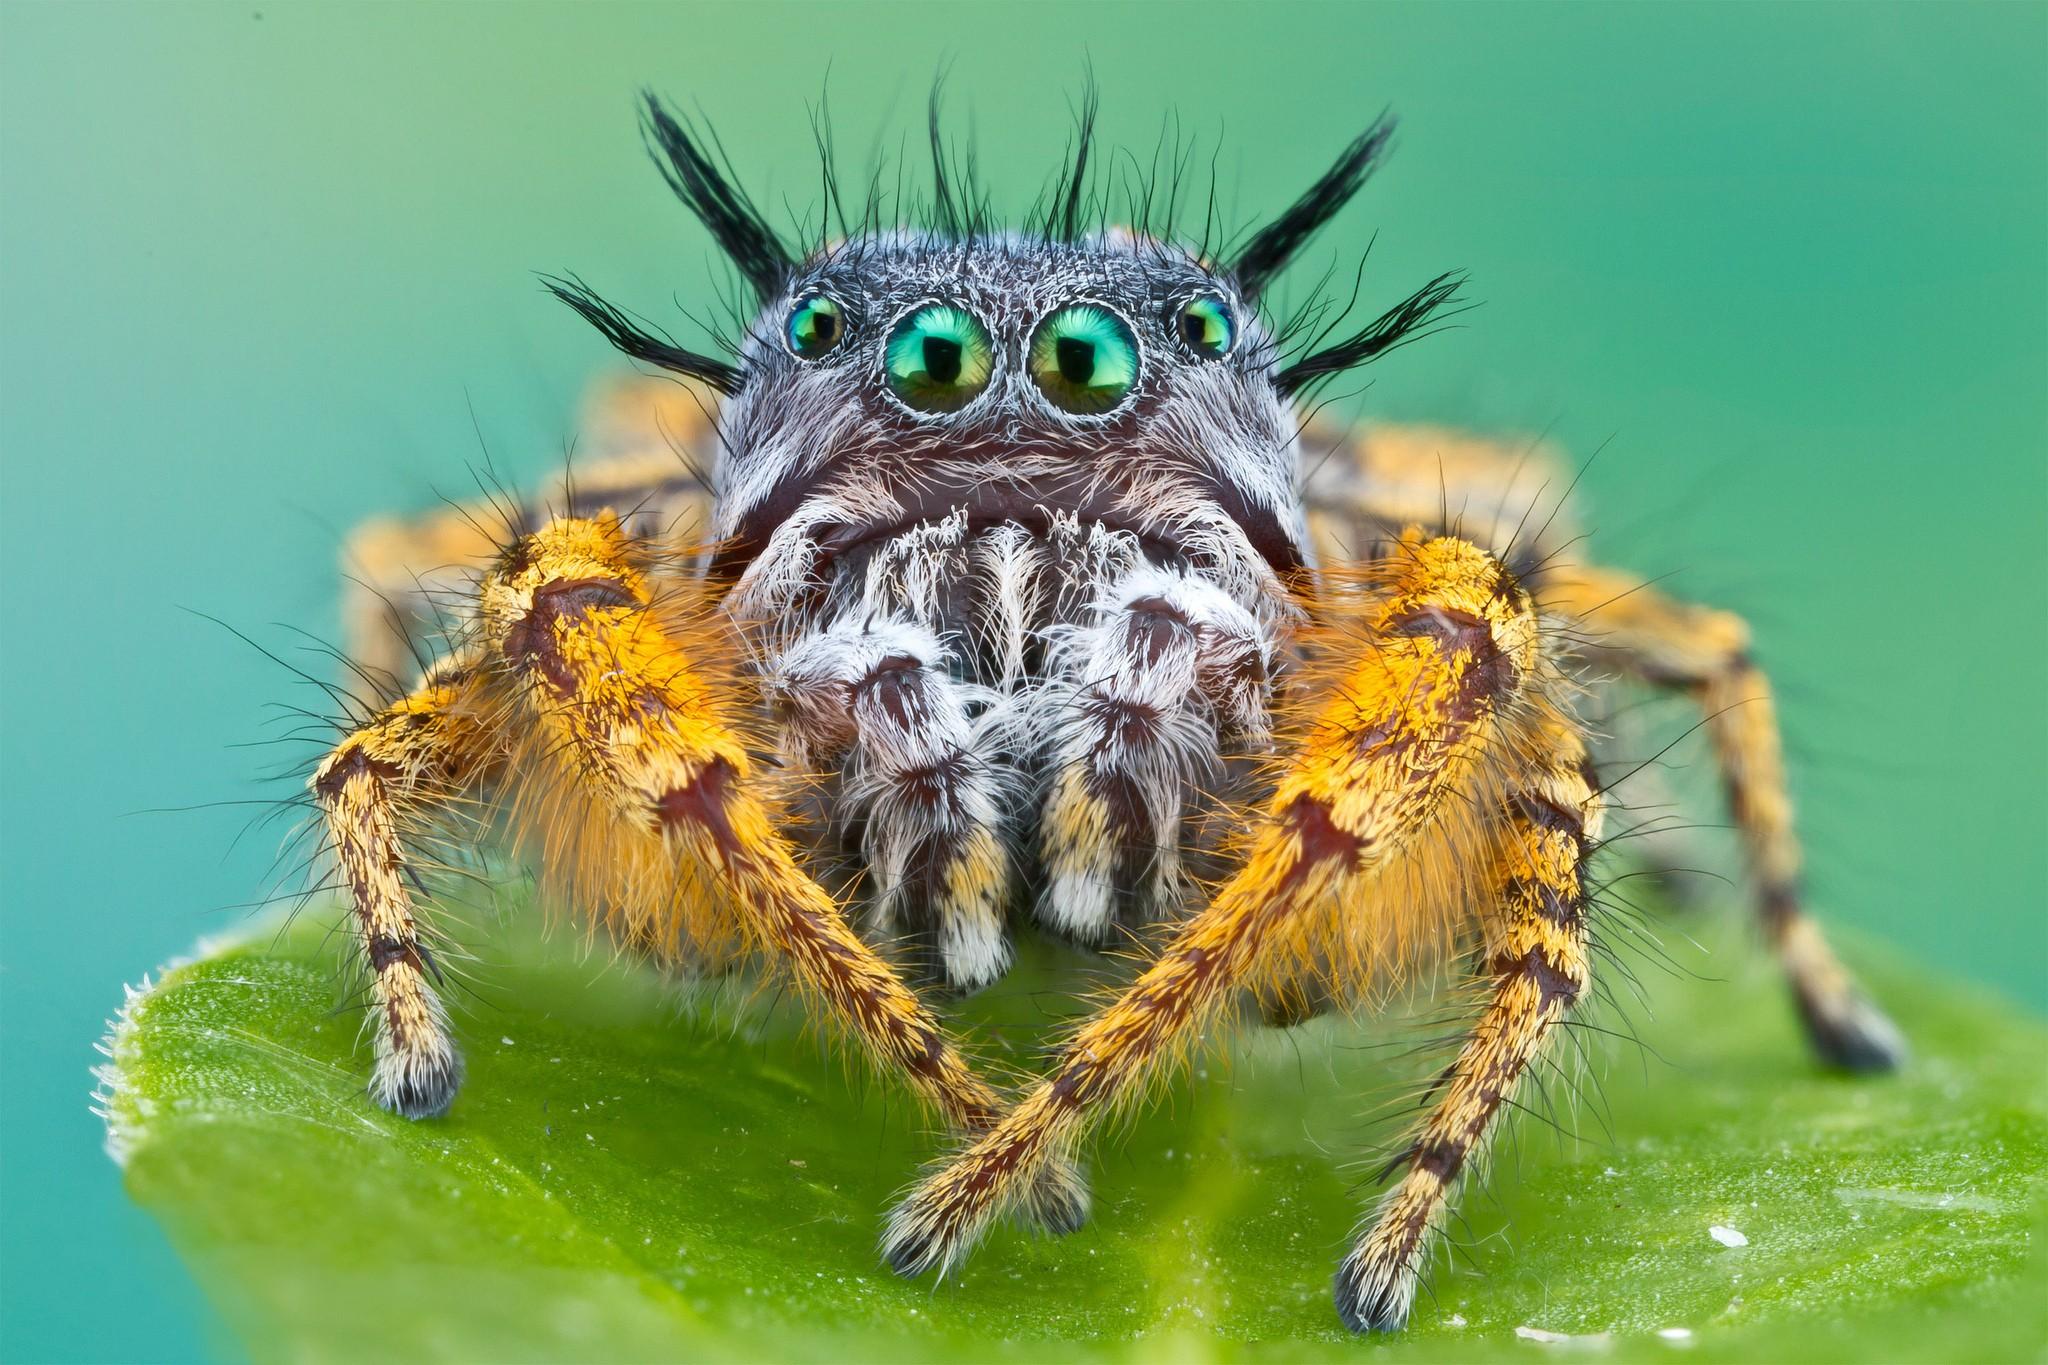 Spider Desktop Wallpaper